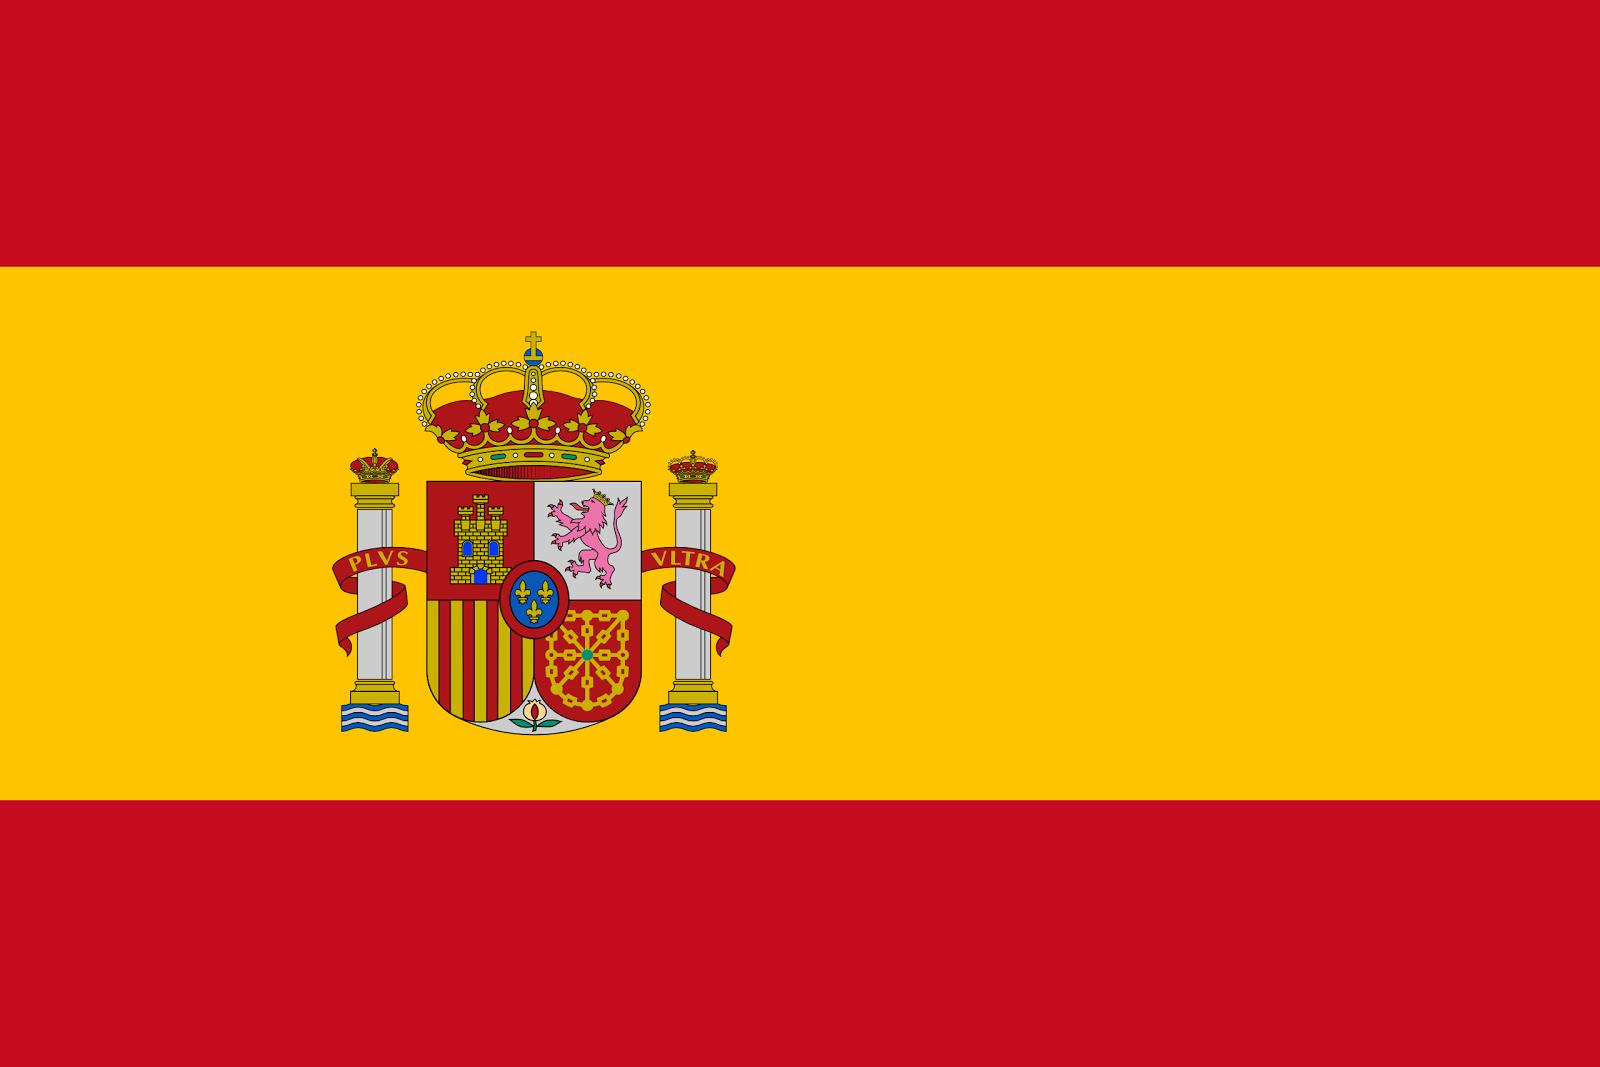 CE Virgen del Pasico. Torre-Pacheco, Murcia